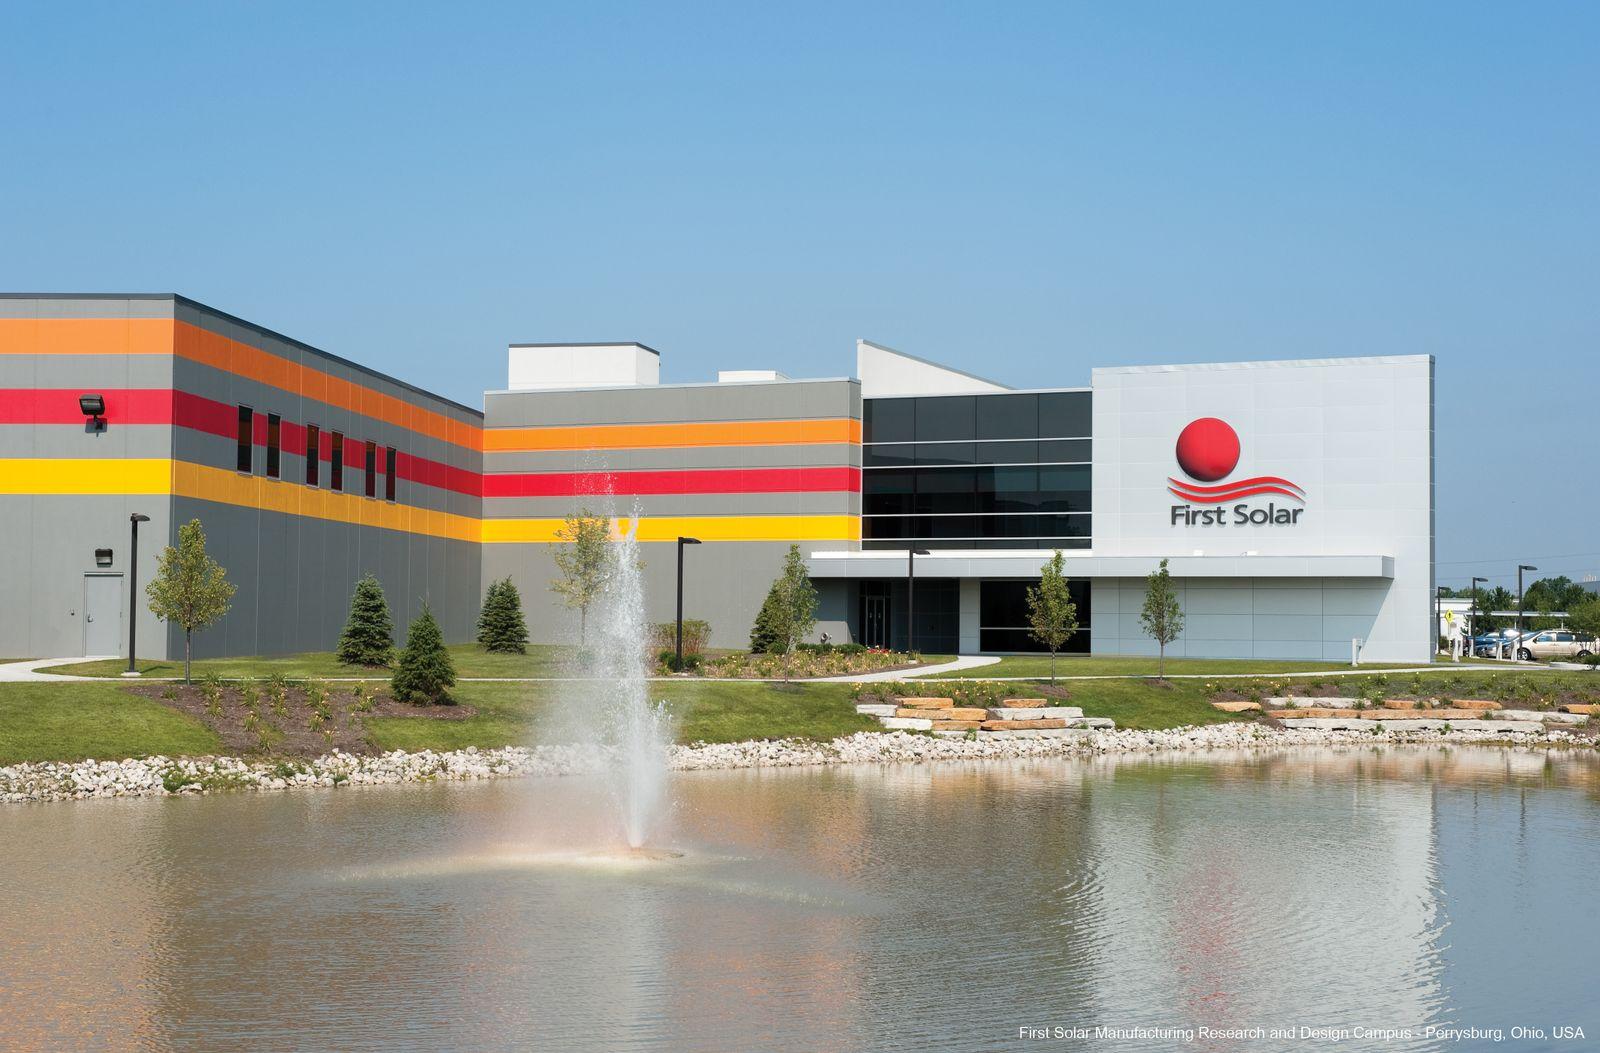 First Solar / Manufactoring / Perrysburg, Ohio, USA